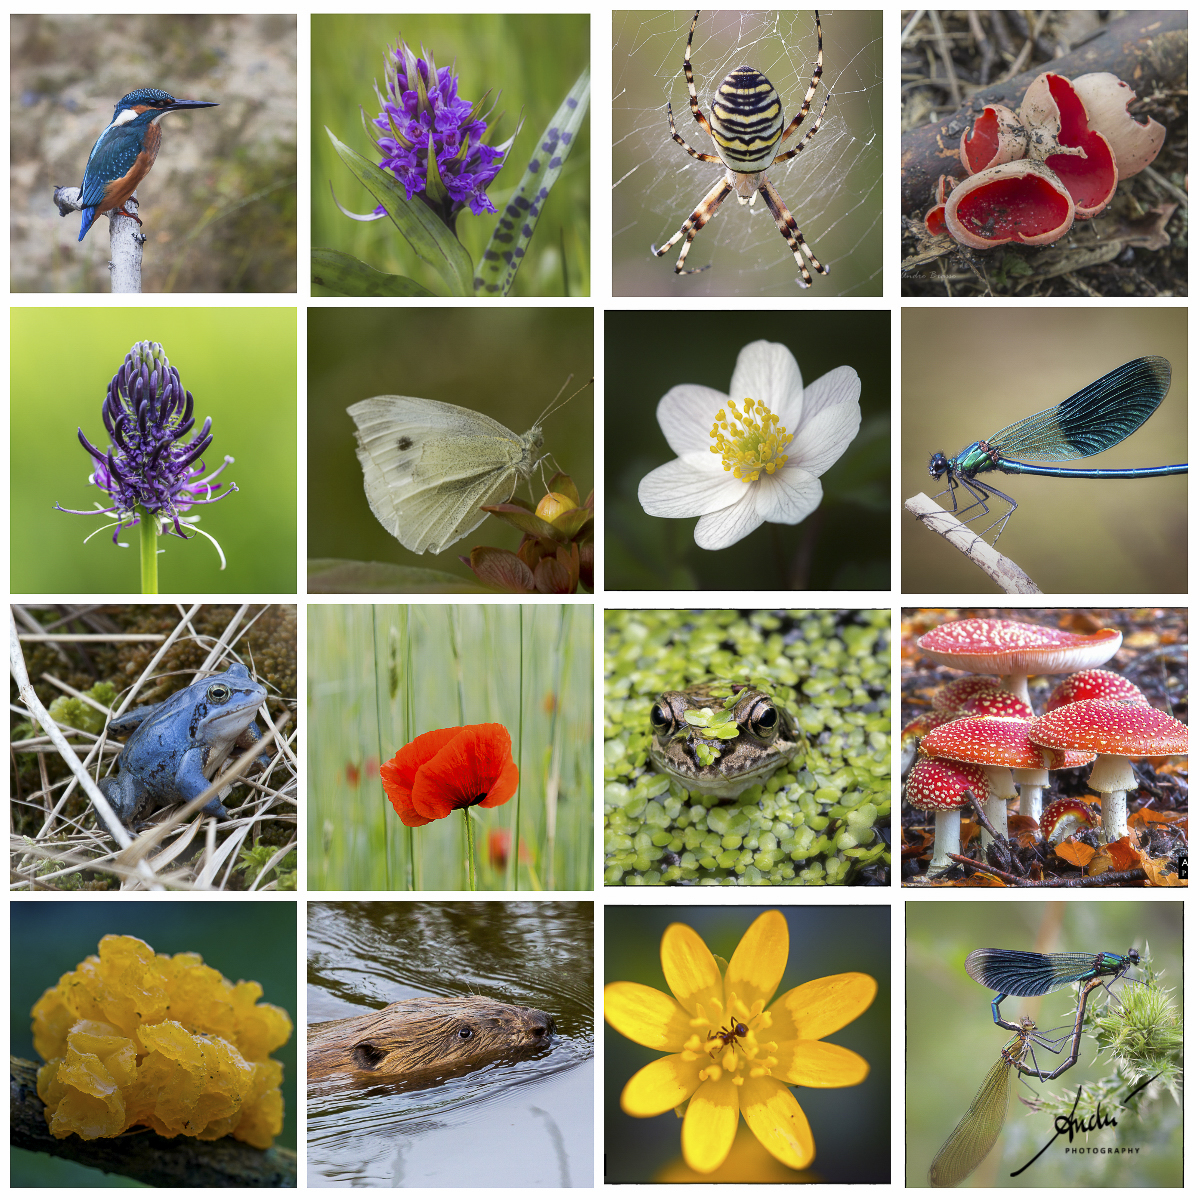 Biodiversiteit en Biodiversitijd